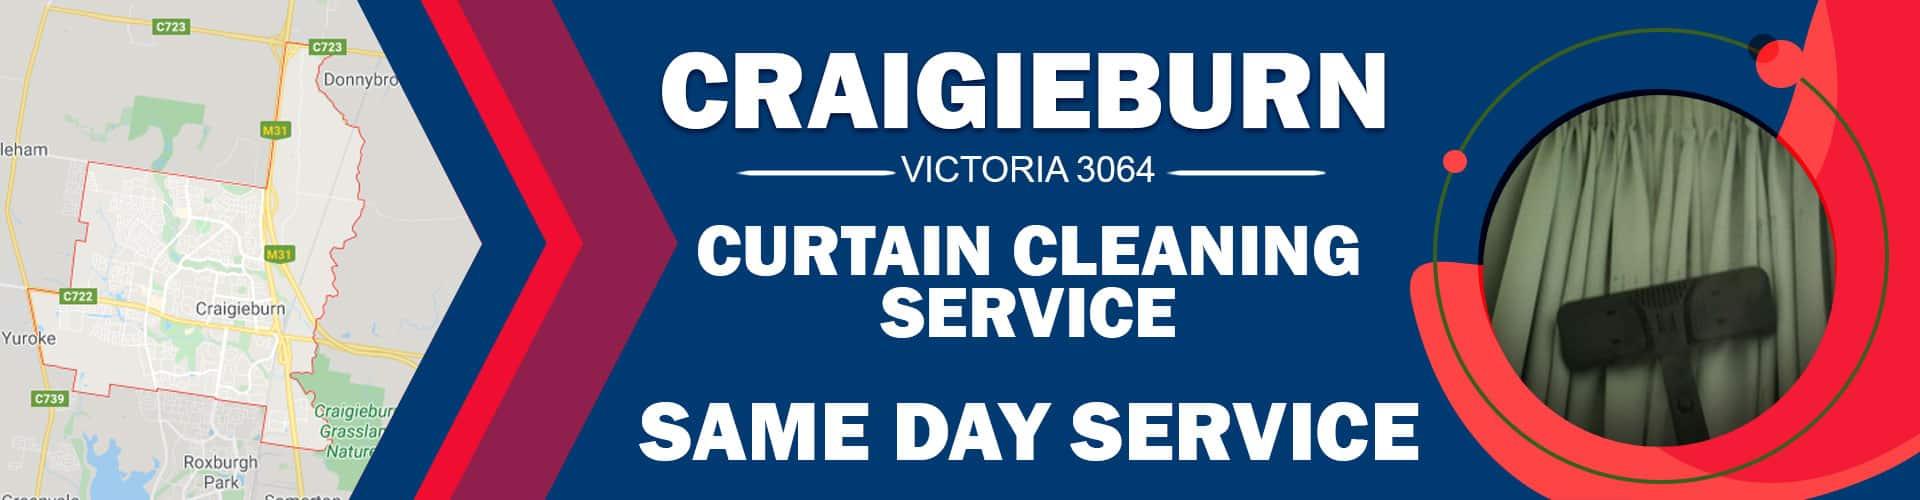 Curtain Cleaning Craigieburn